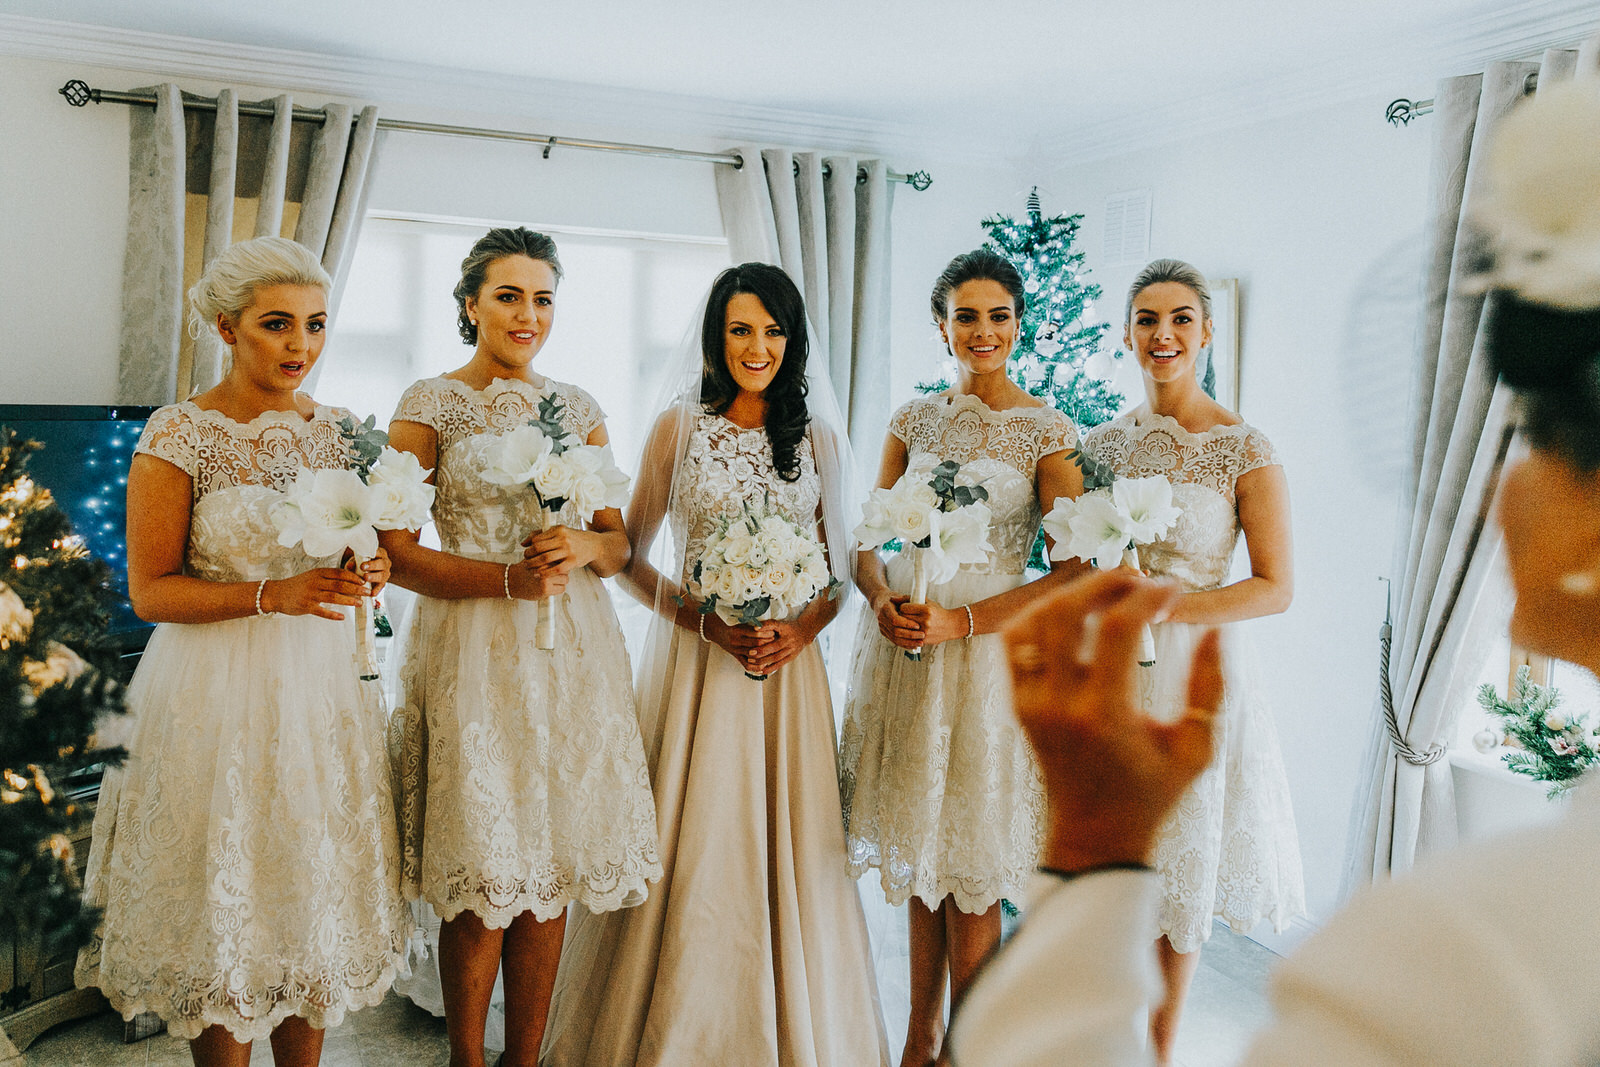 Roger_Kenny_wedding_photographer_420.jpg